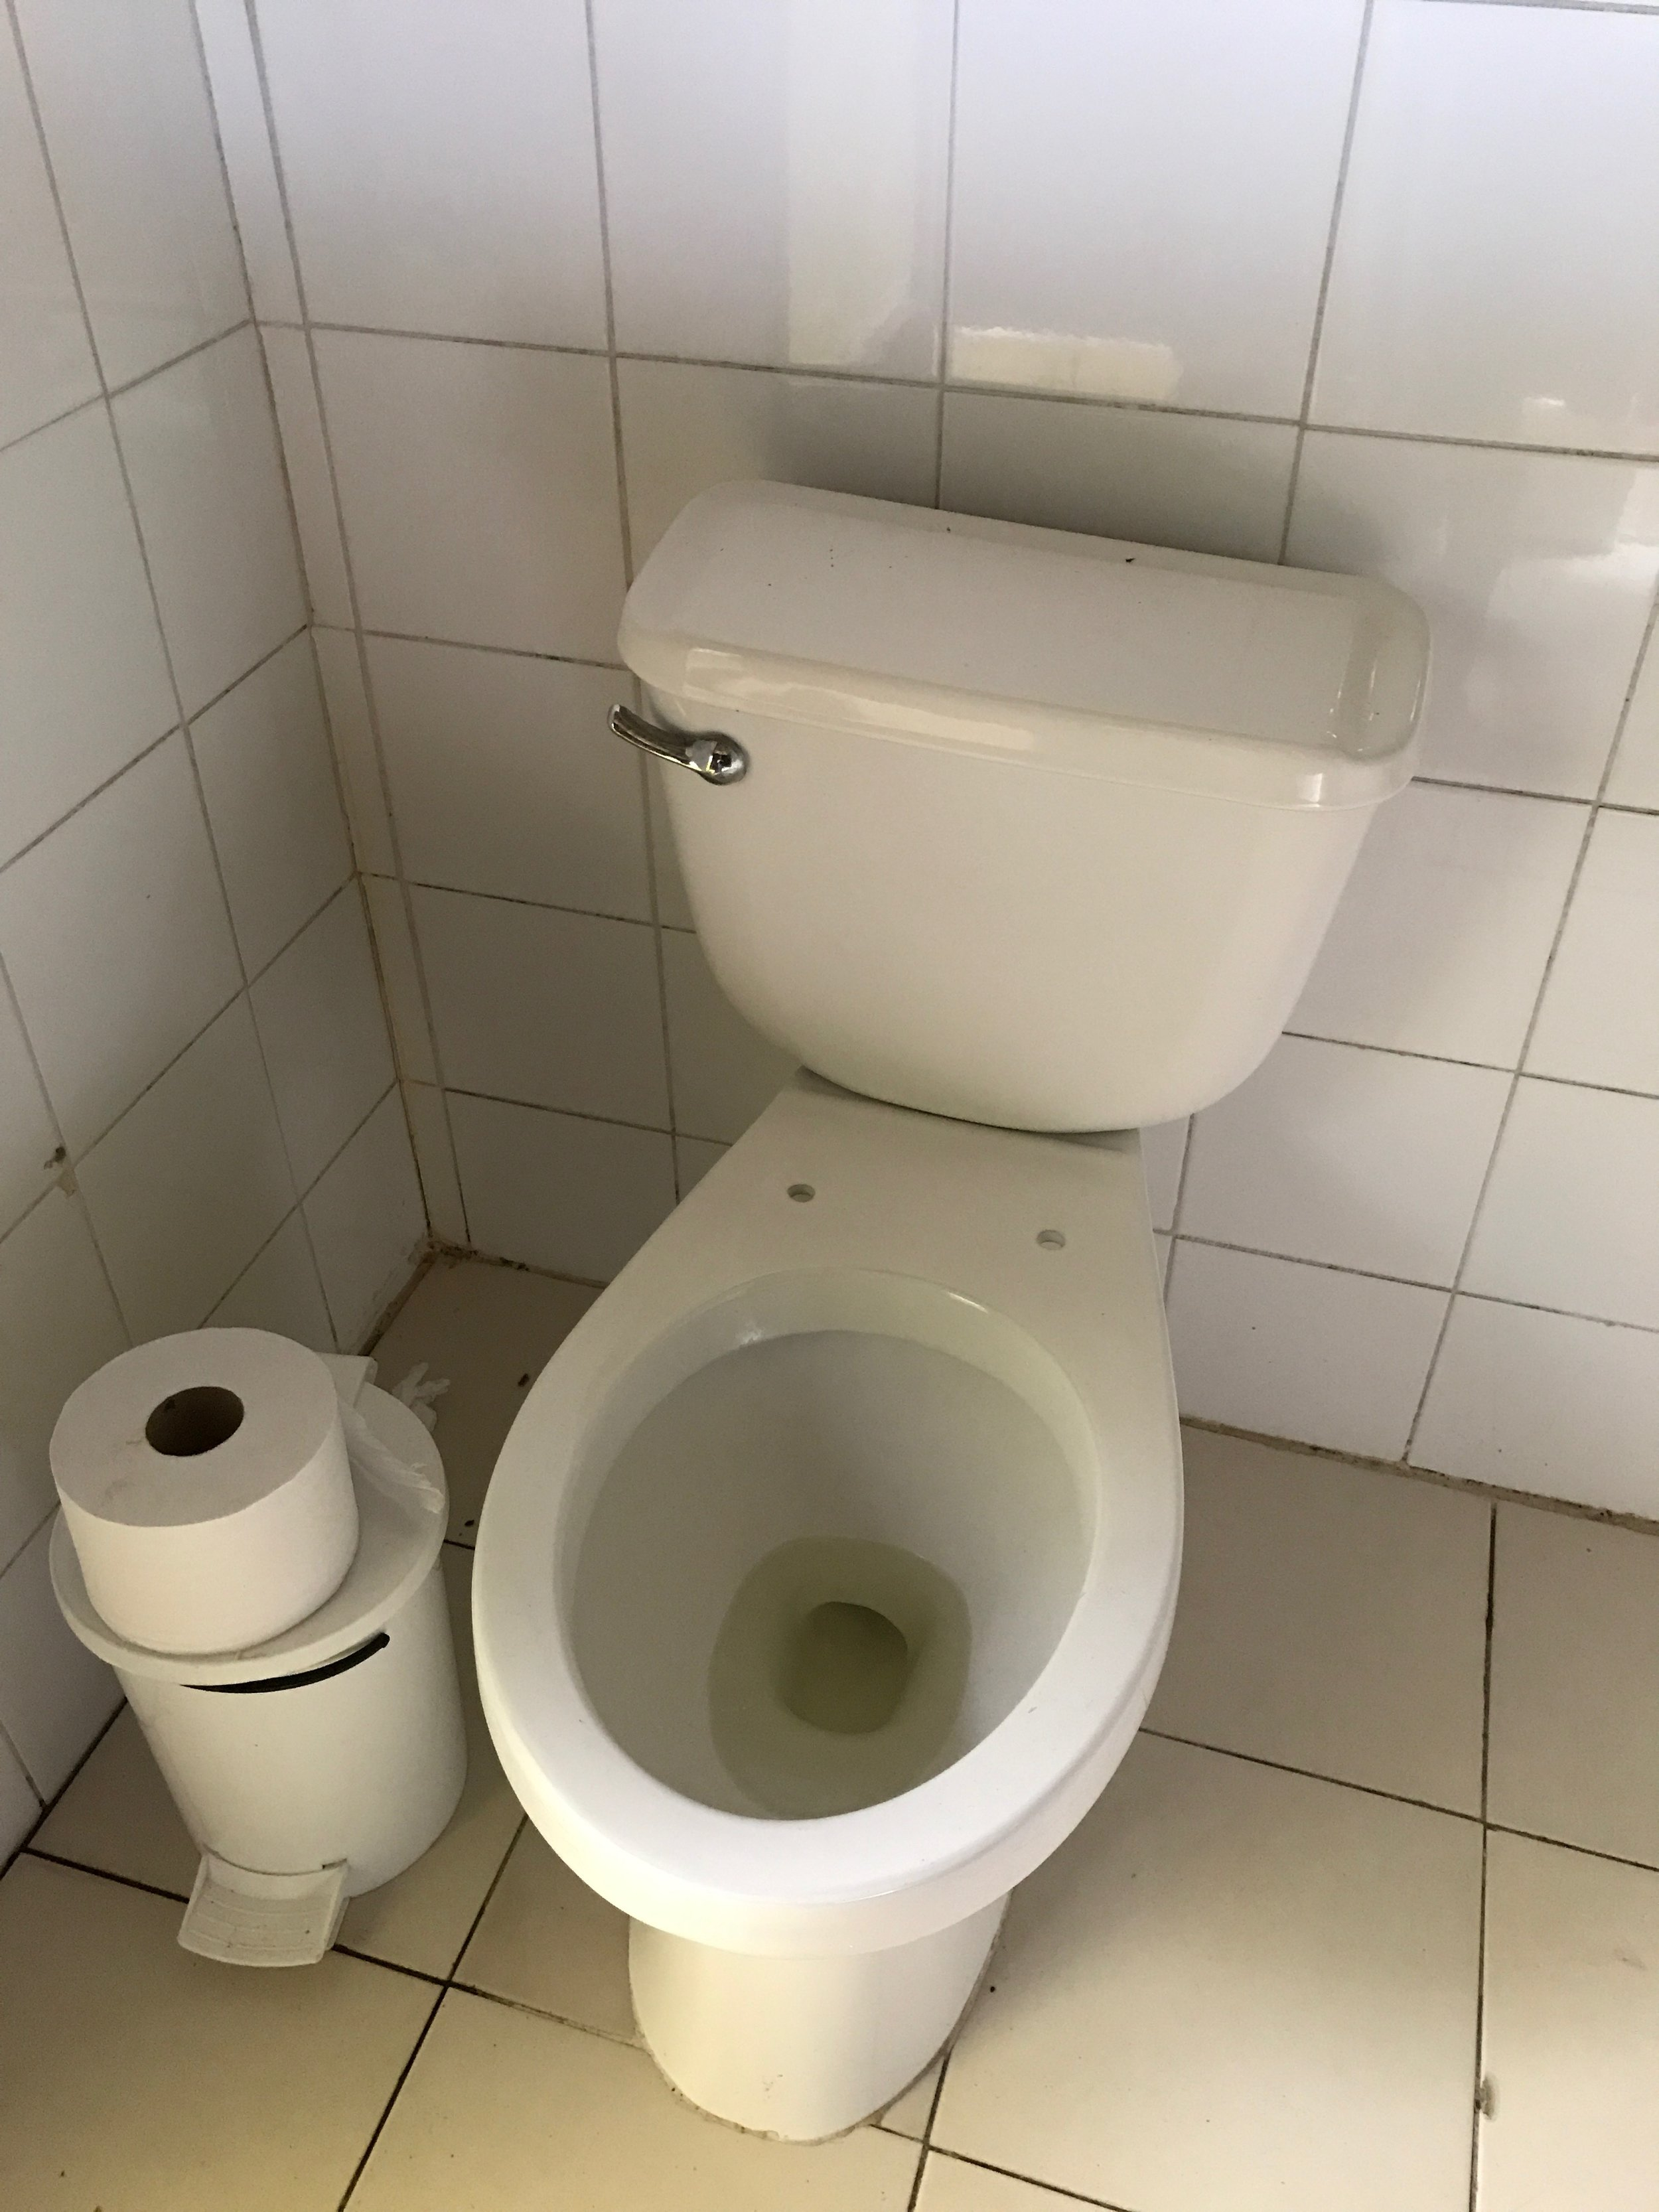 Typical Cuban restroom.